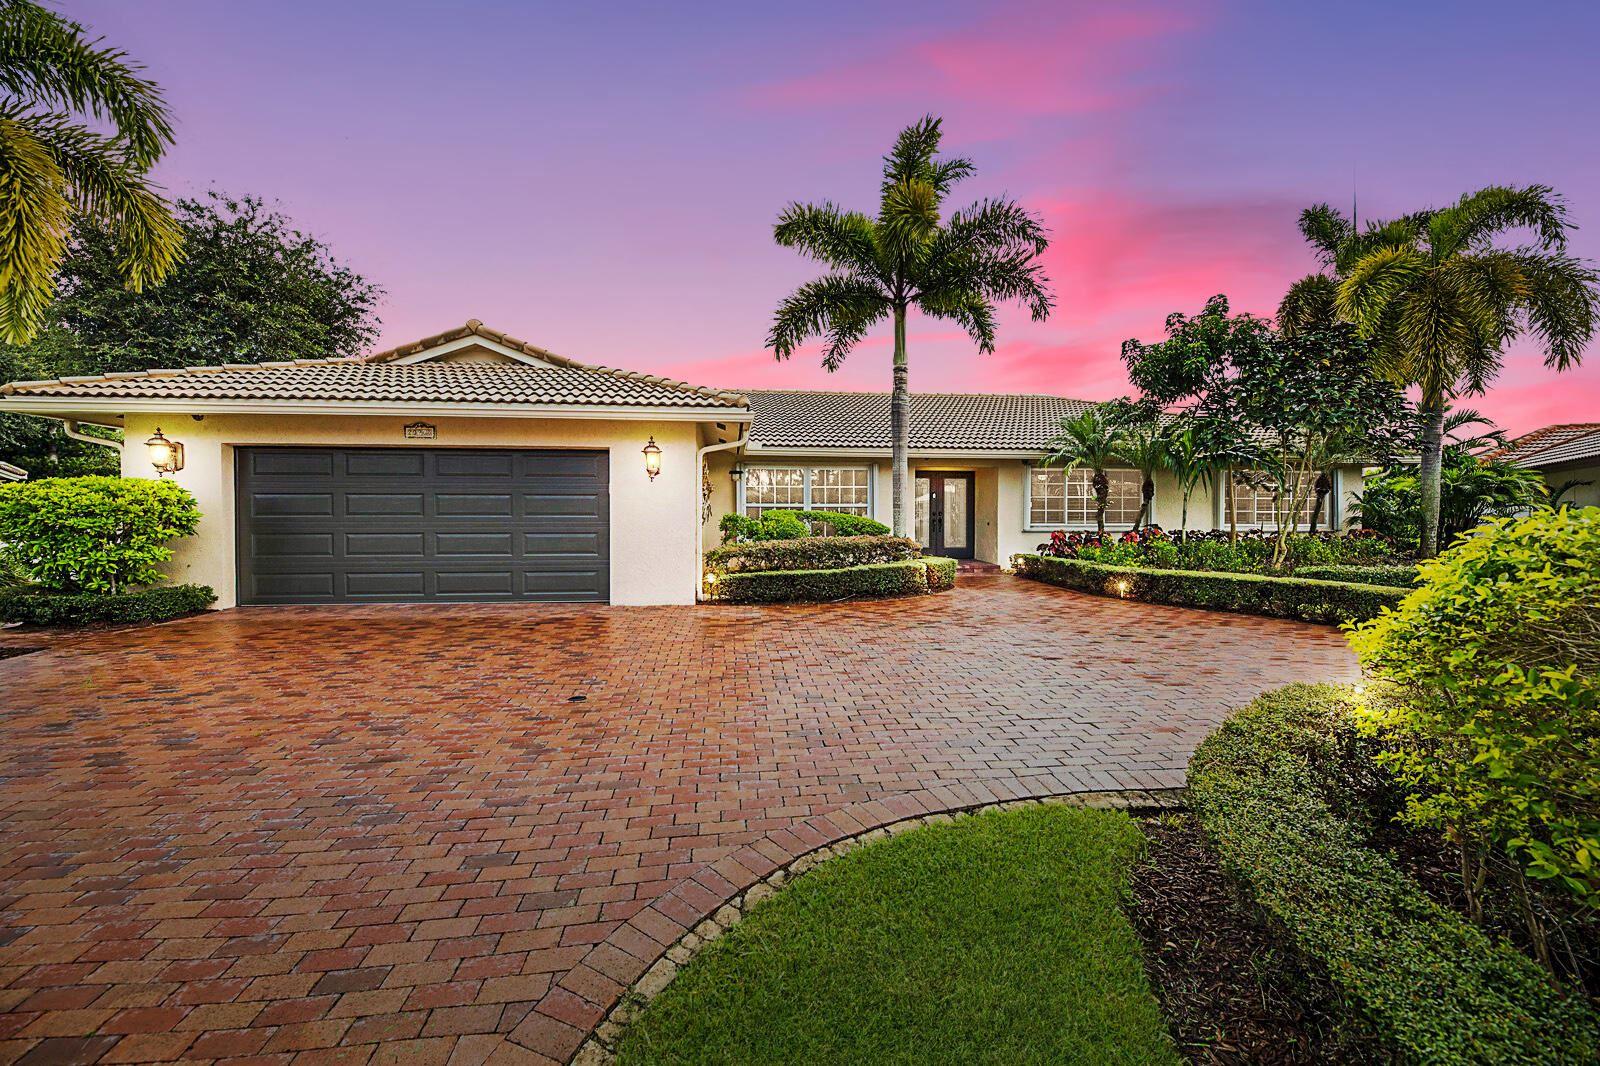 20968 Certosa Terrace, Boca Raton, FL 33433 - #: RX-10658921